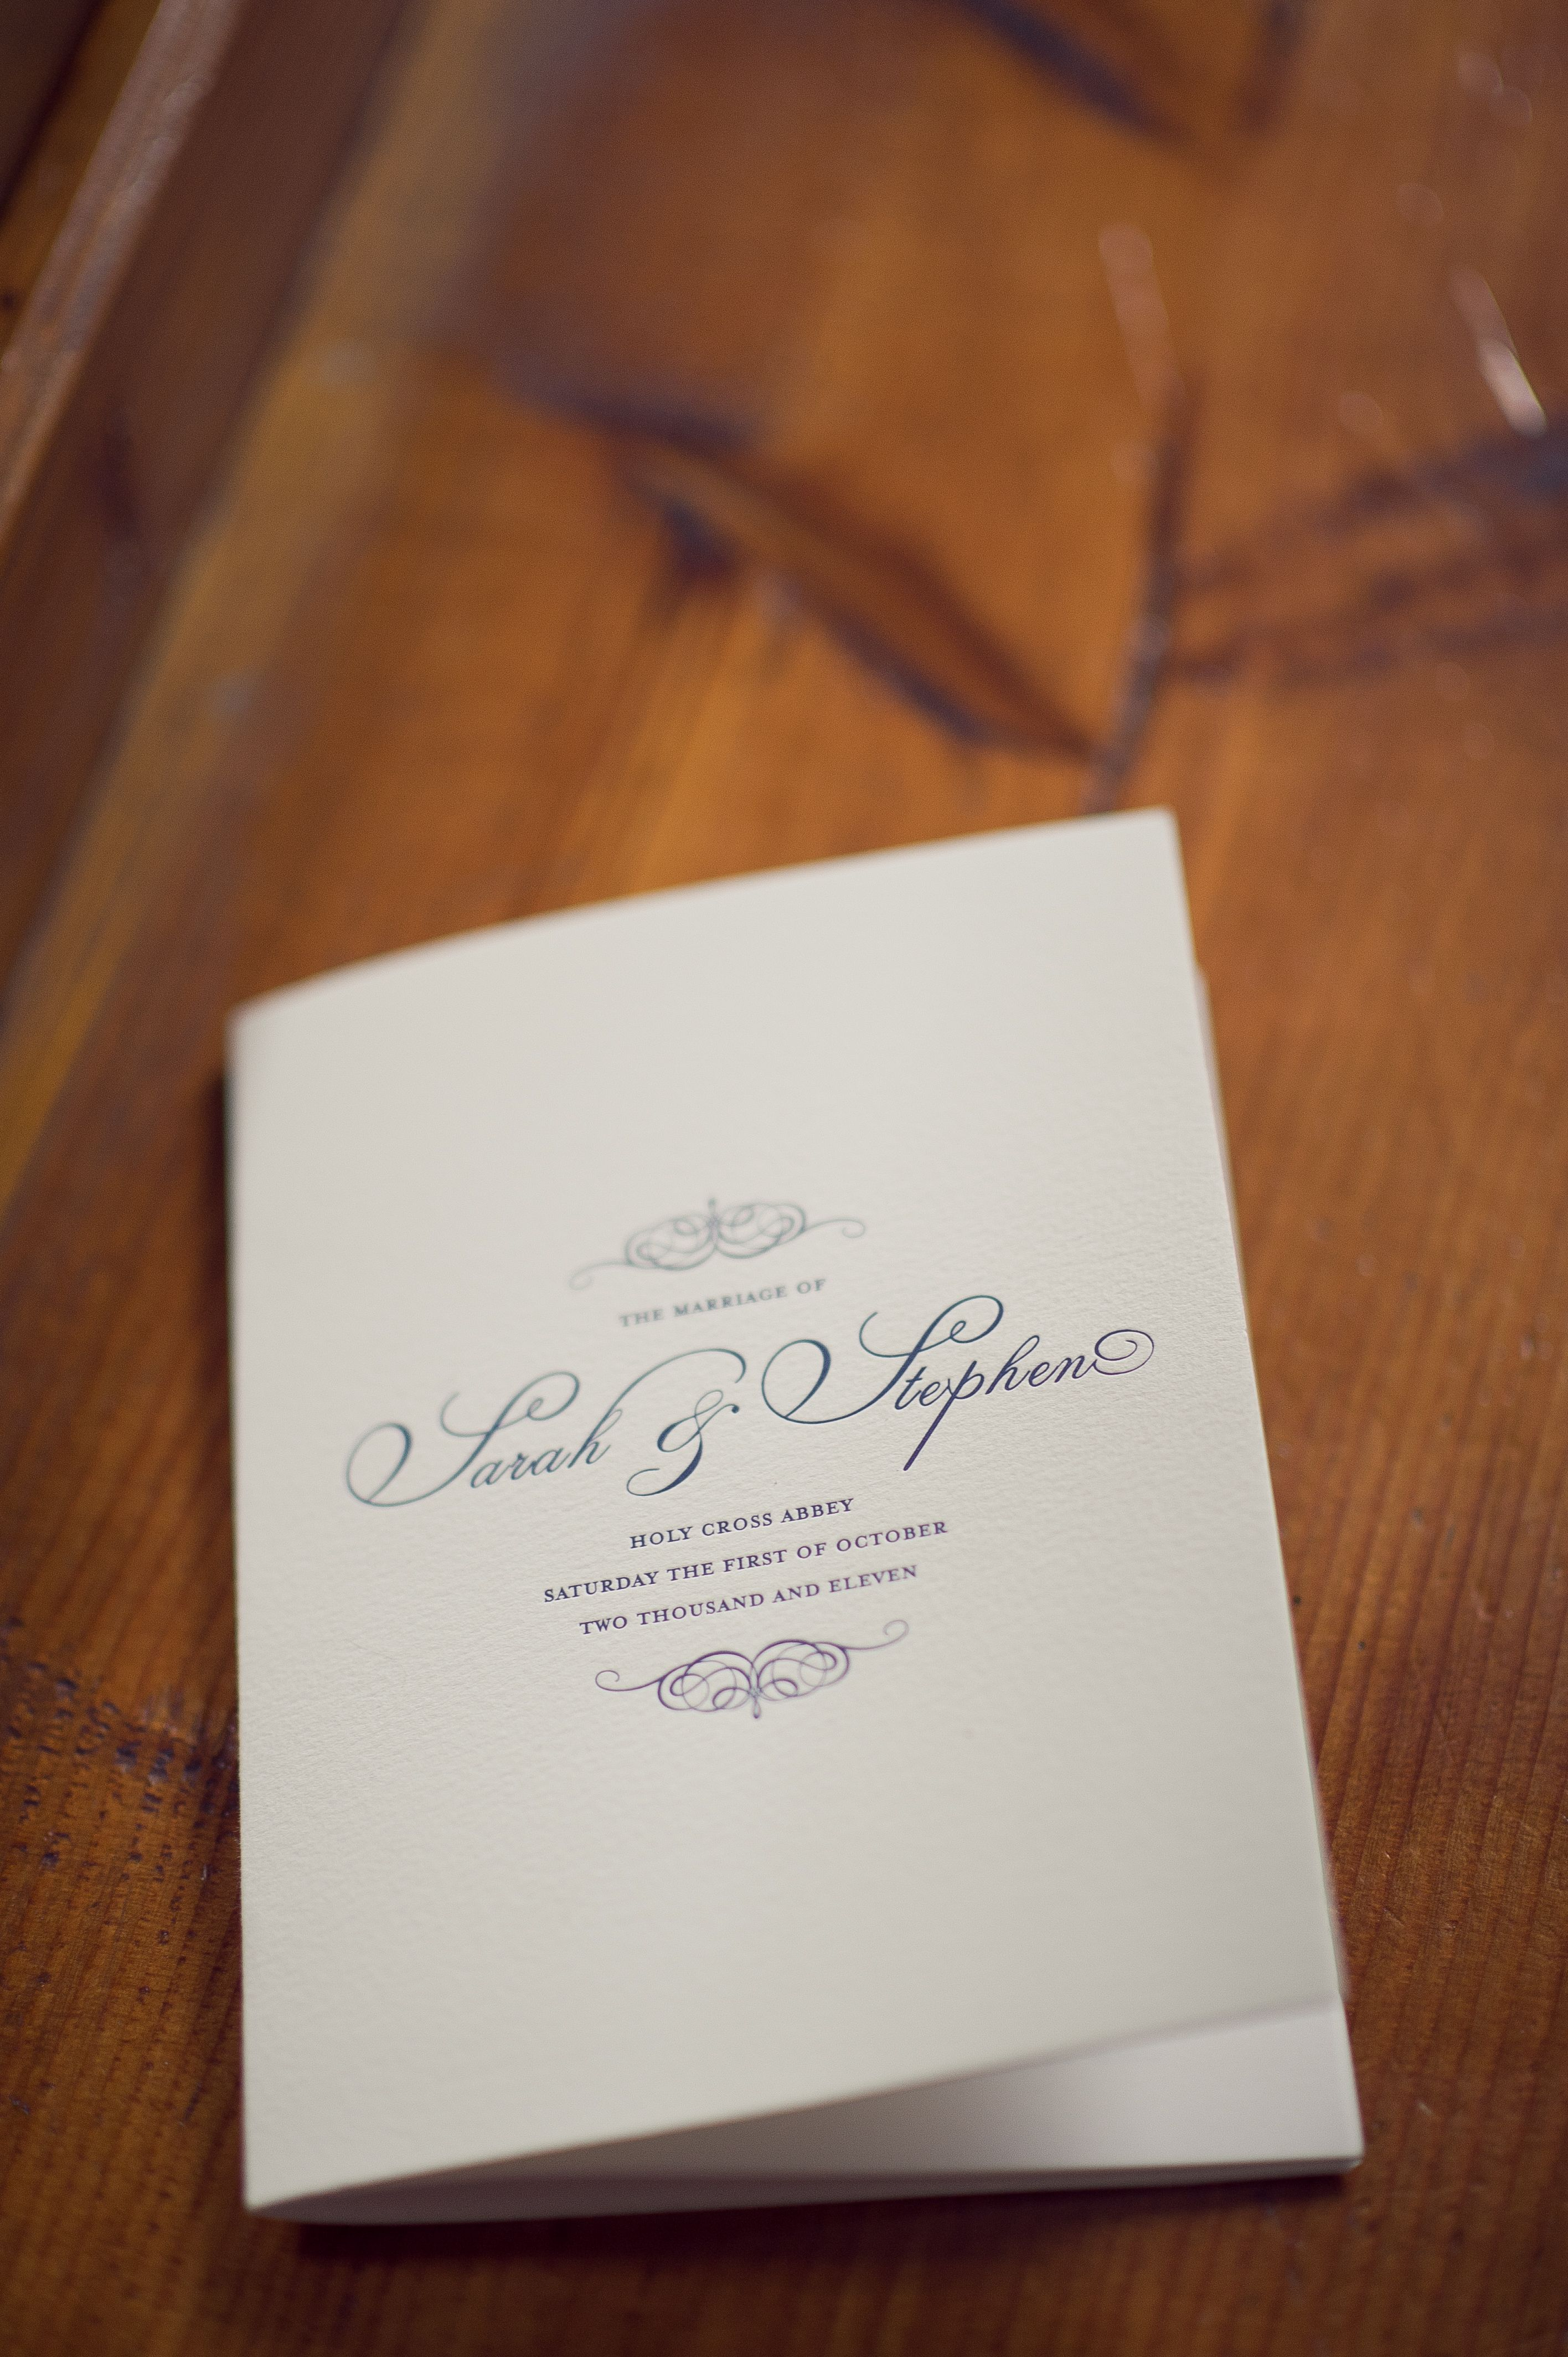 Letterpress Wedding Ceremony Booklet Cover   Wedding - mass booklet ...